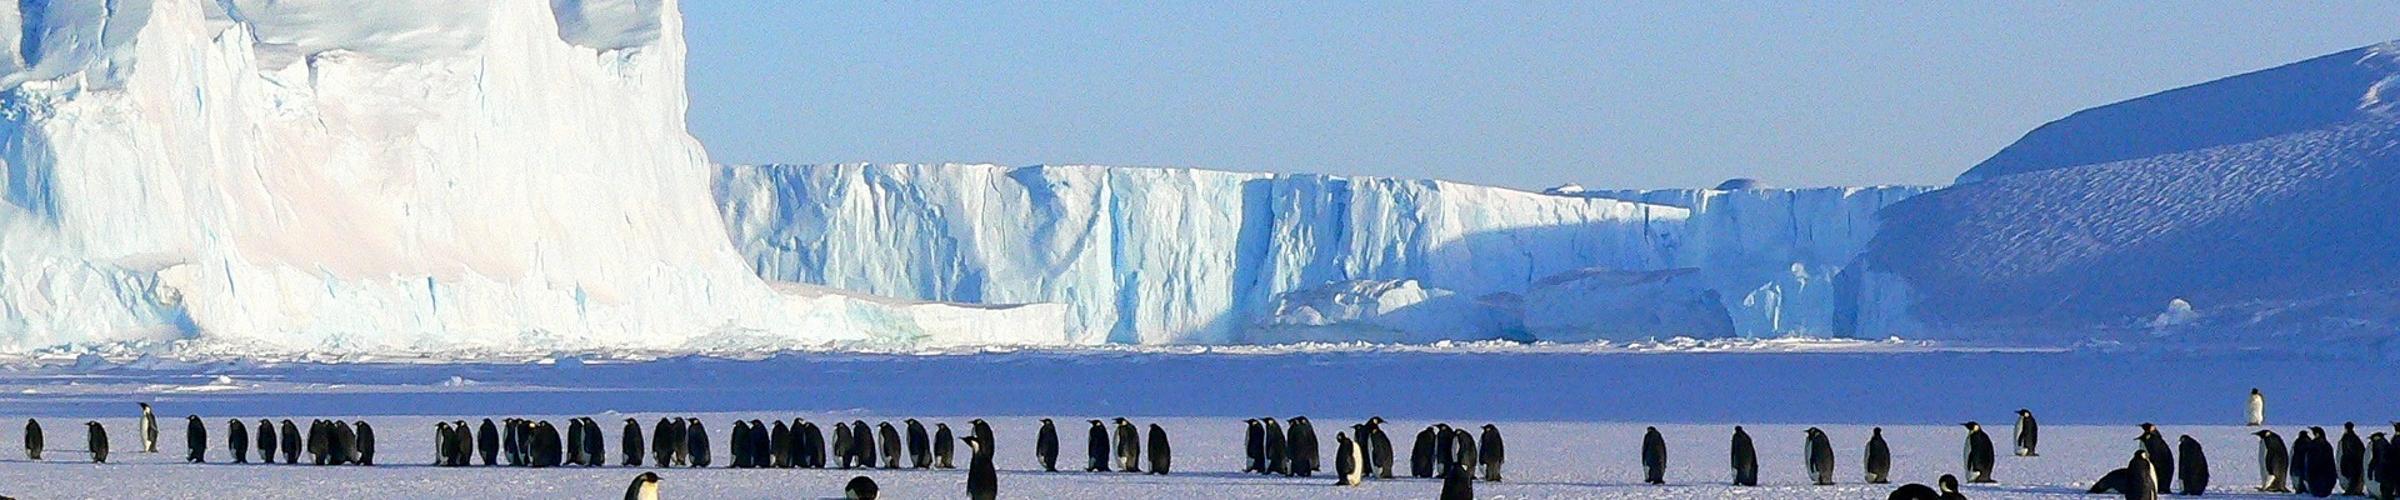 Celebrating Antarctica with the SDGs: Antarctica Day 1 December